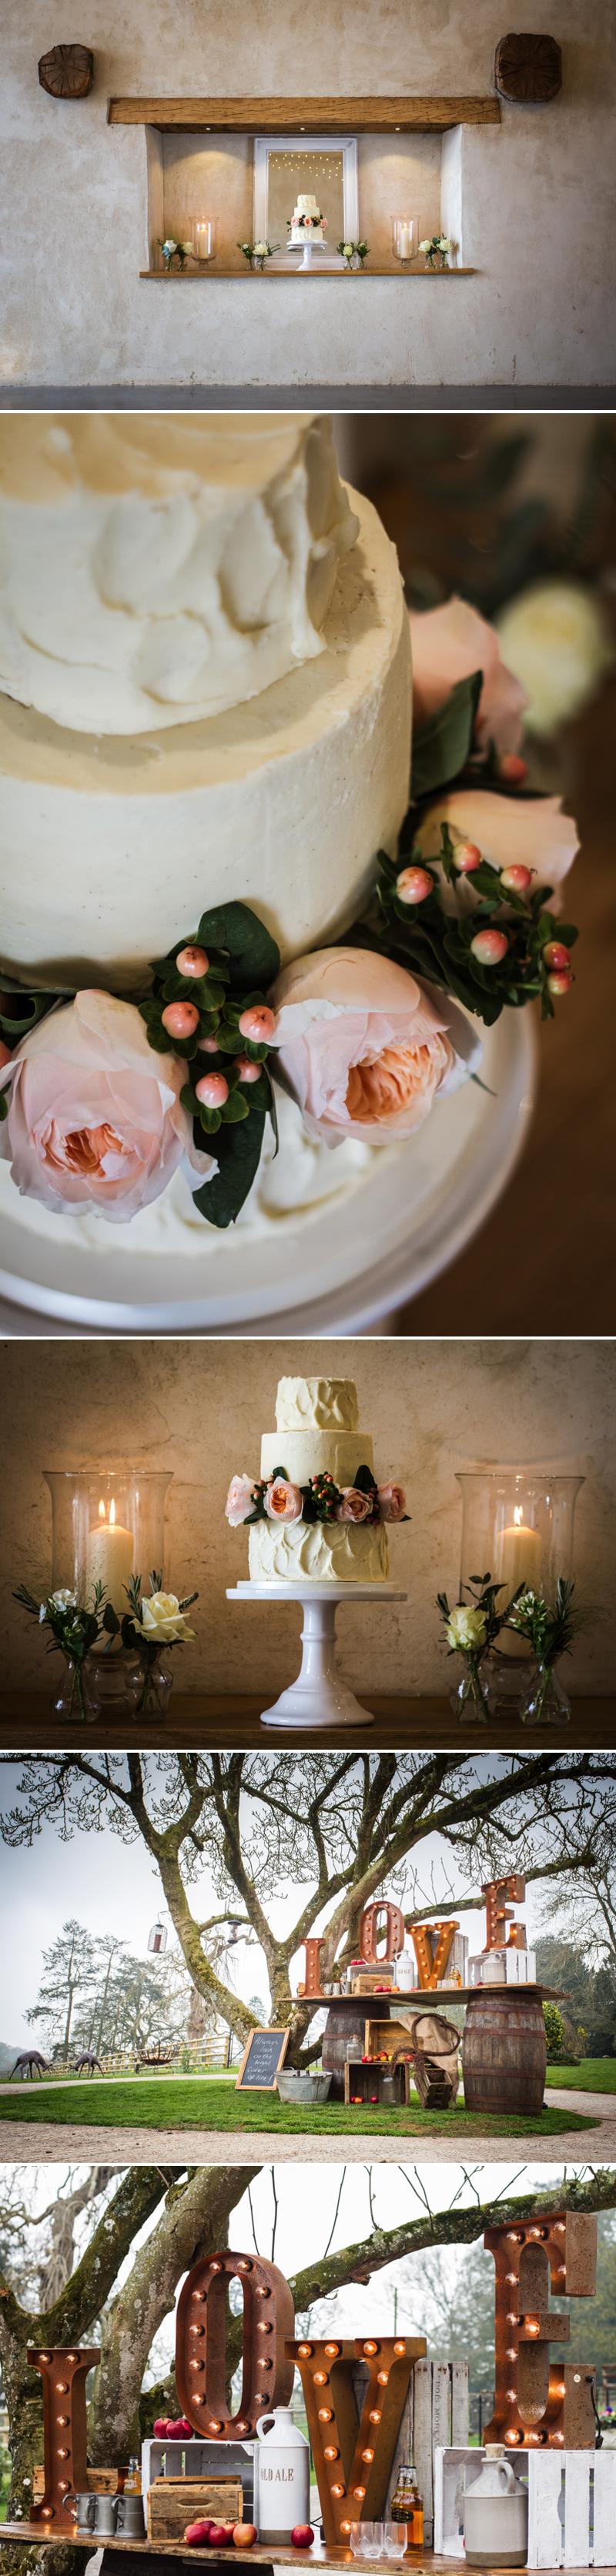 wedding-venues-in-devon-uk-wedding-venue-directory-upton-barn-and-walled-garden-rustic-inspired-styled-shoot-coco-wedding-venues-002